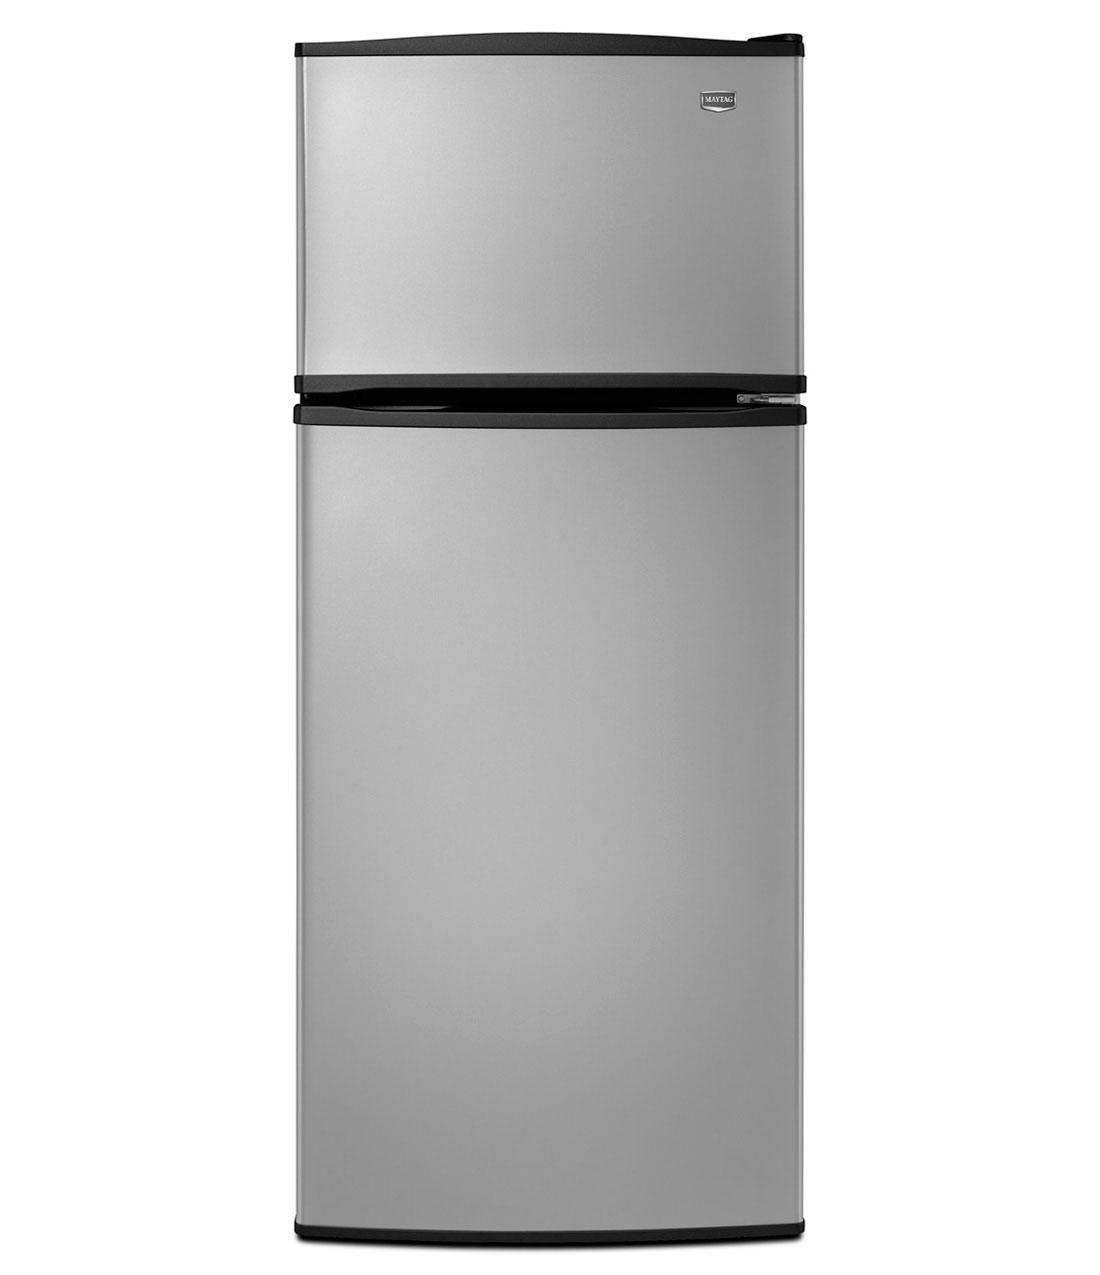 maytag apartment fridge maytag refrigerator. Black Bedroom Furniture Sets. Home Design Ideas